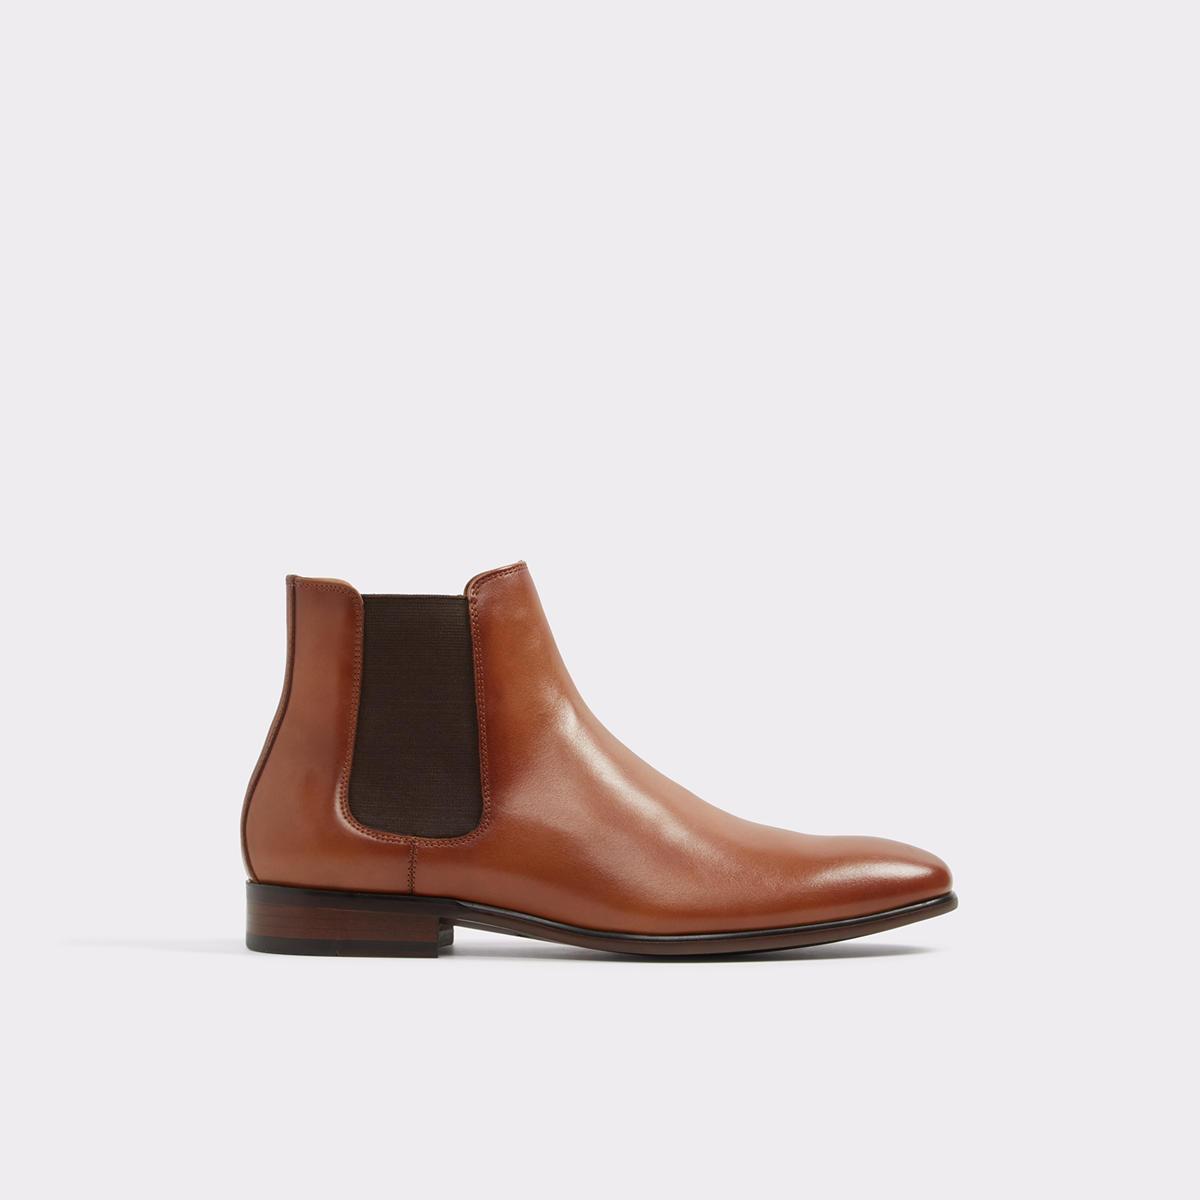 Aradowen Cognac Men's Dress boots | ALDO US at Aldo Shoes in Victor, NY | Tuggl